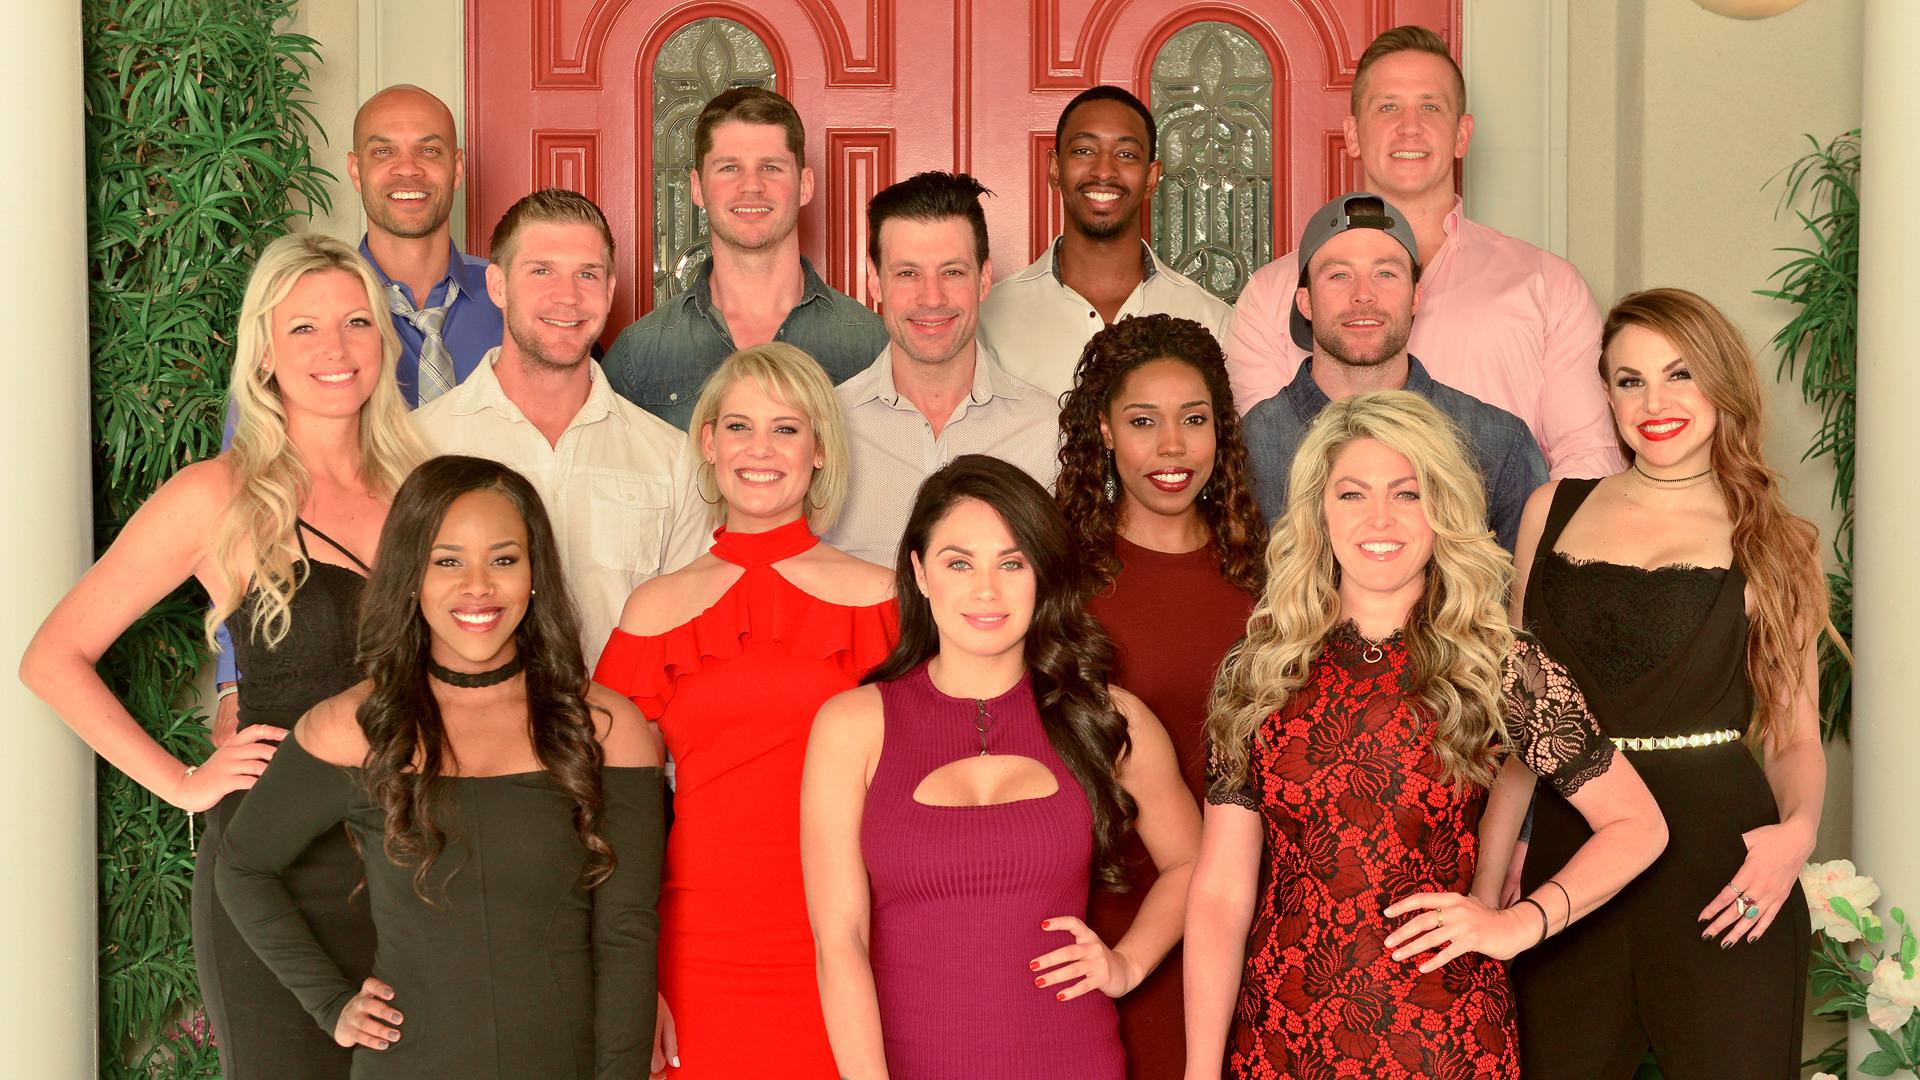 Mark Burnett Reality Dating Series Coming to Fox This Year